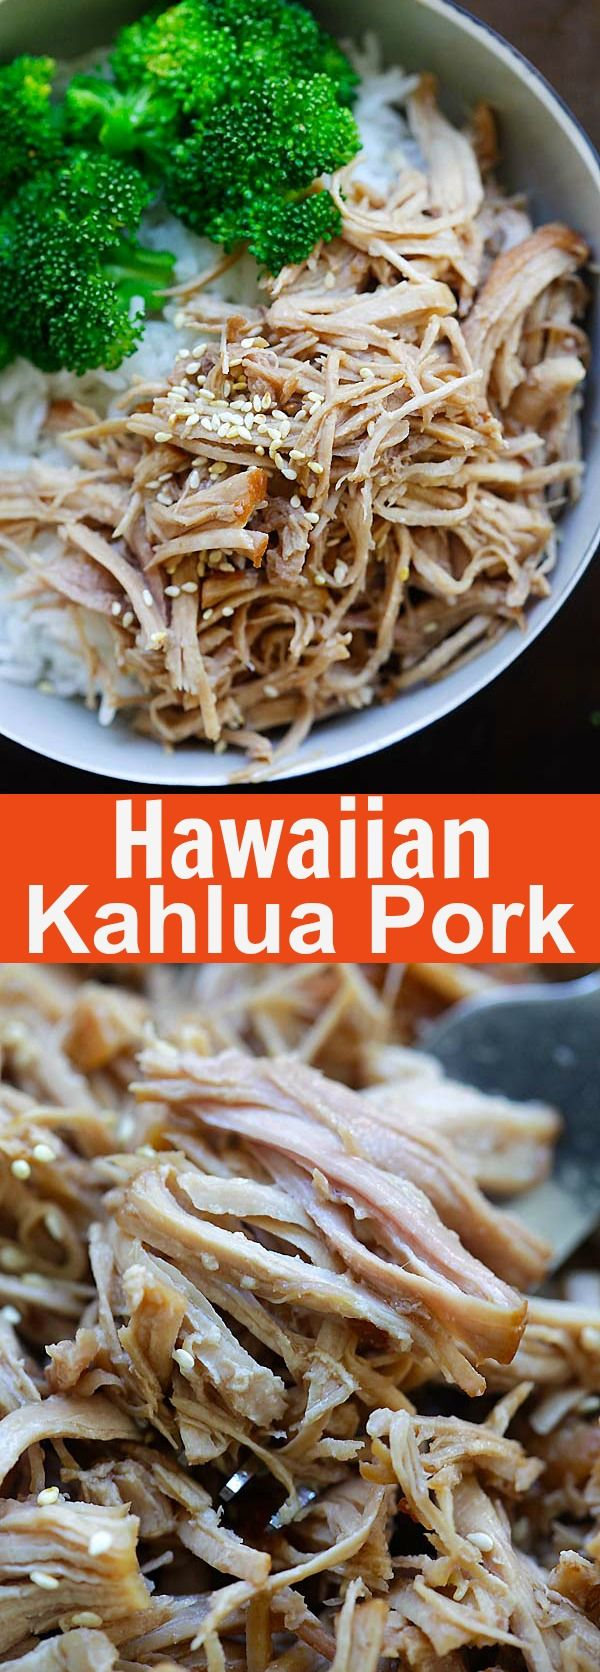 Hawaiian Kalua Pork (Instant Pot) - tender and juicy pressure cooker Hawaiian Kalua pork recipe. 10 mins active time and dinner is done   rasamalaysia.com